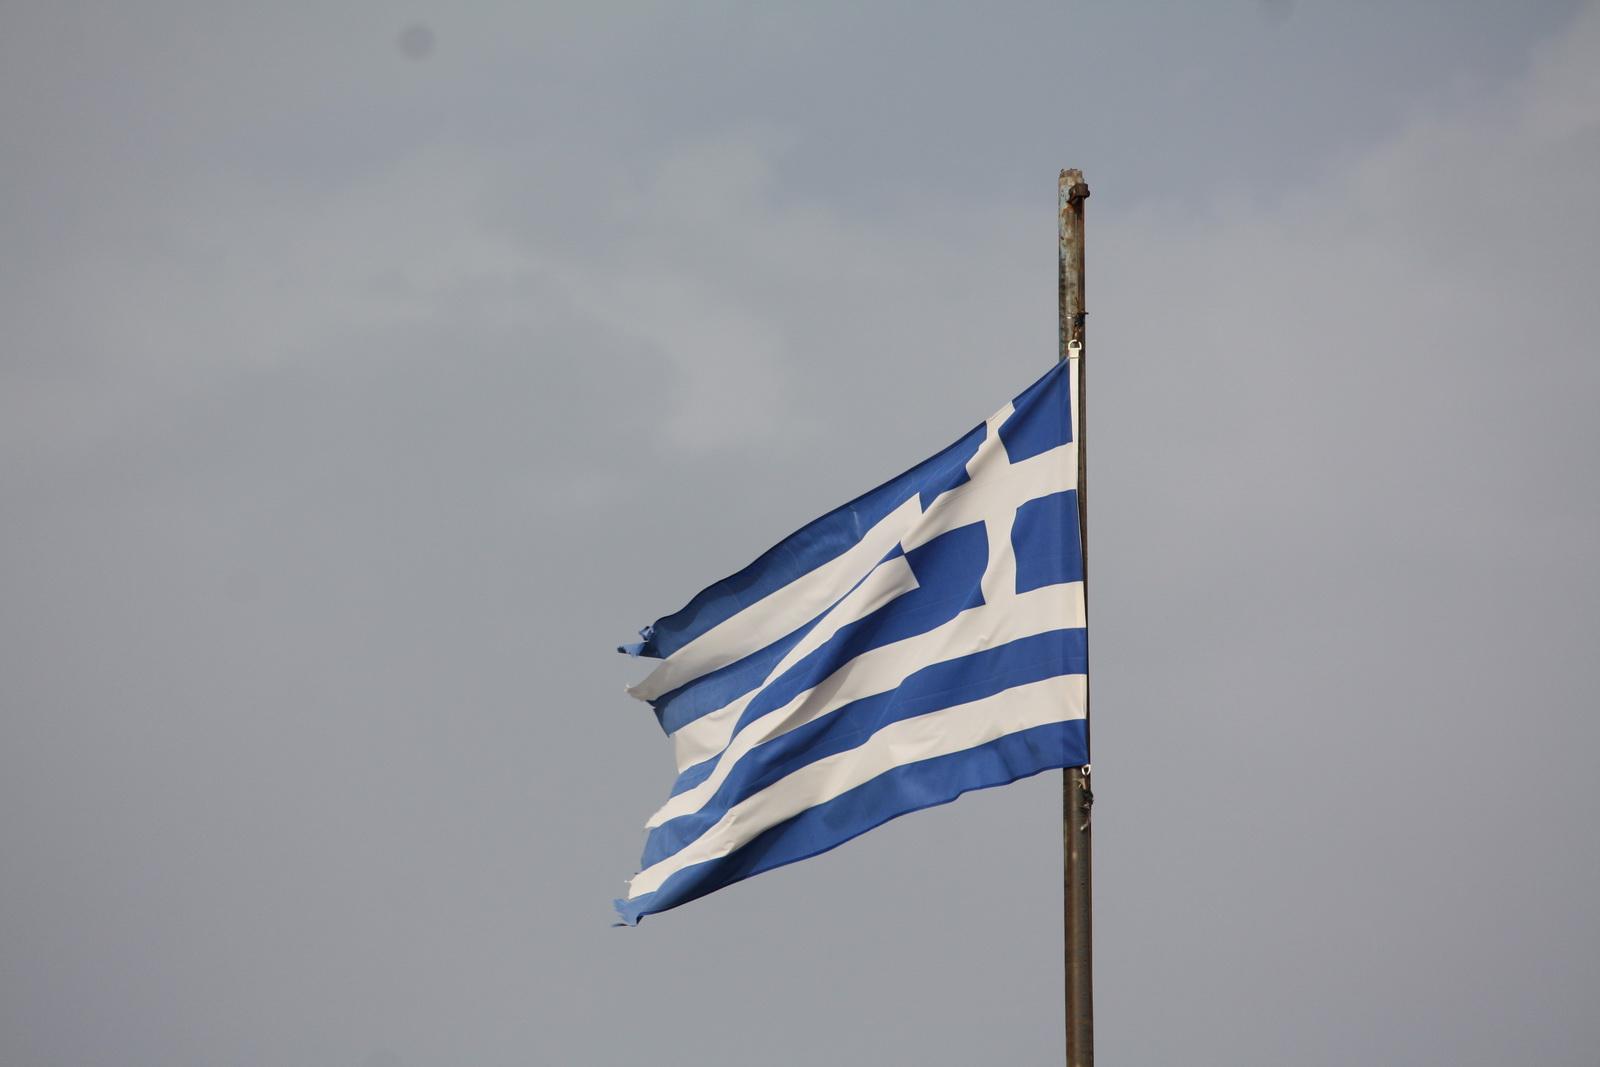 IMG_8291 σημαία_resize